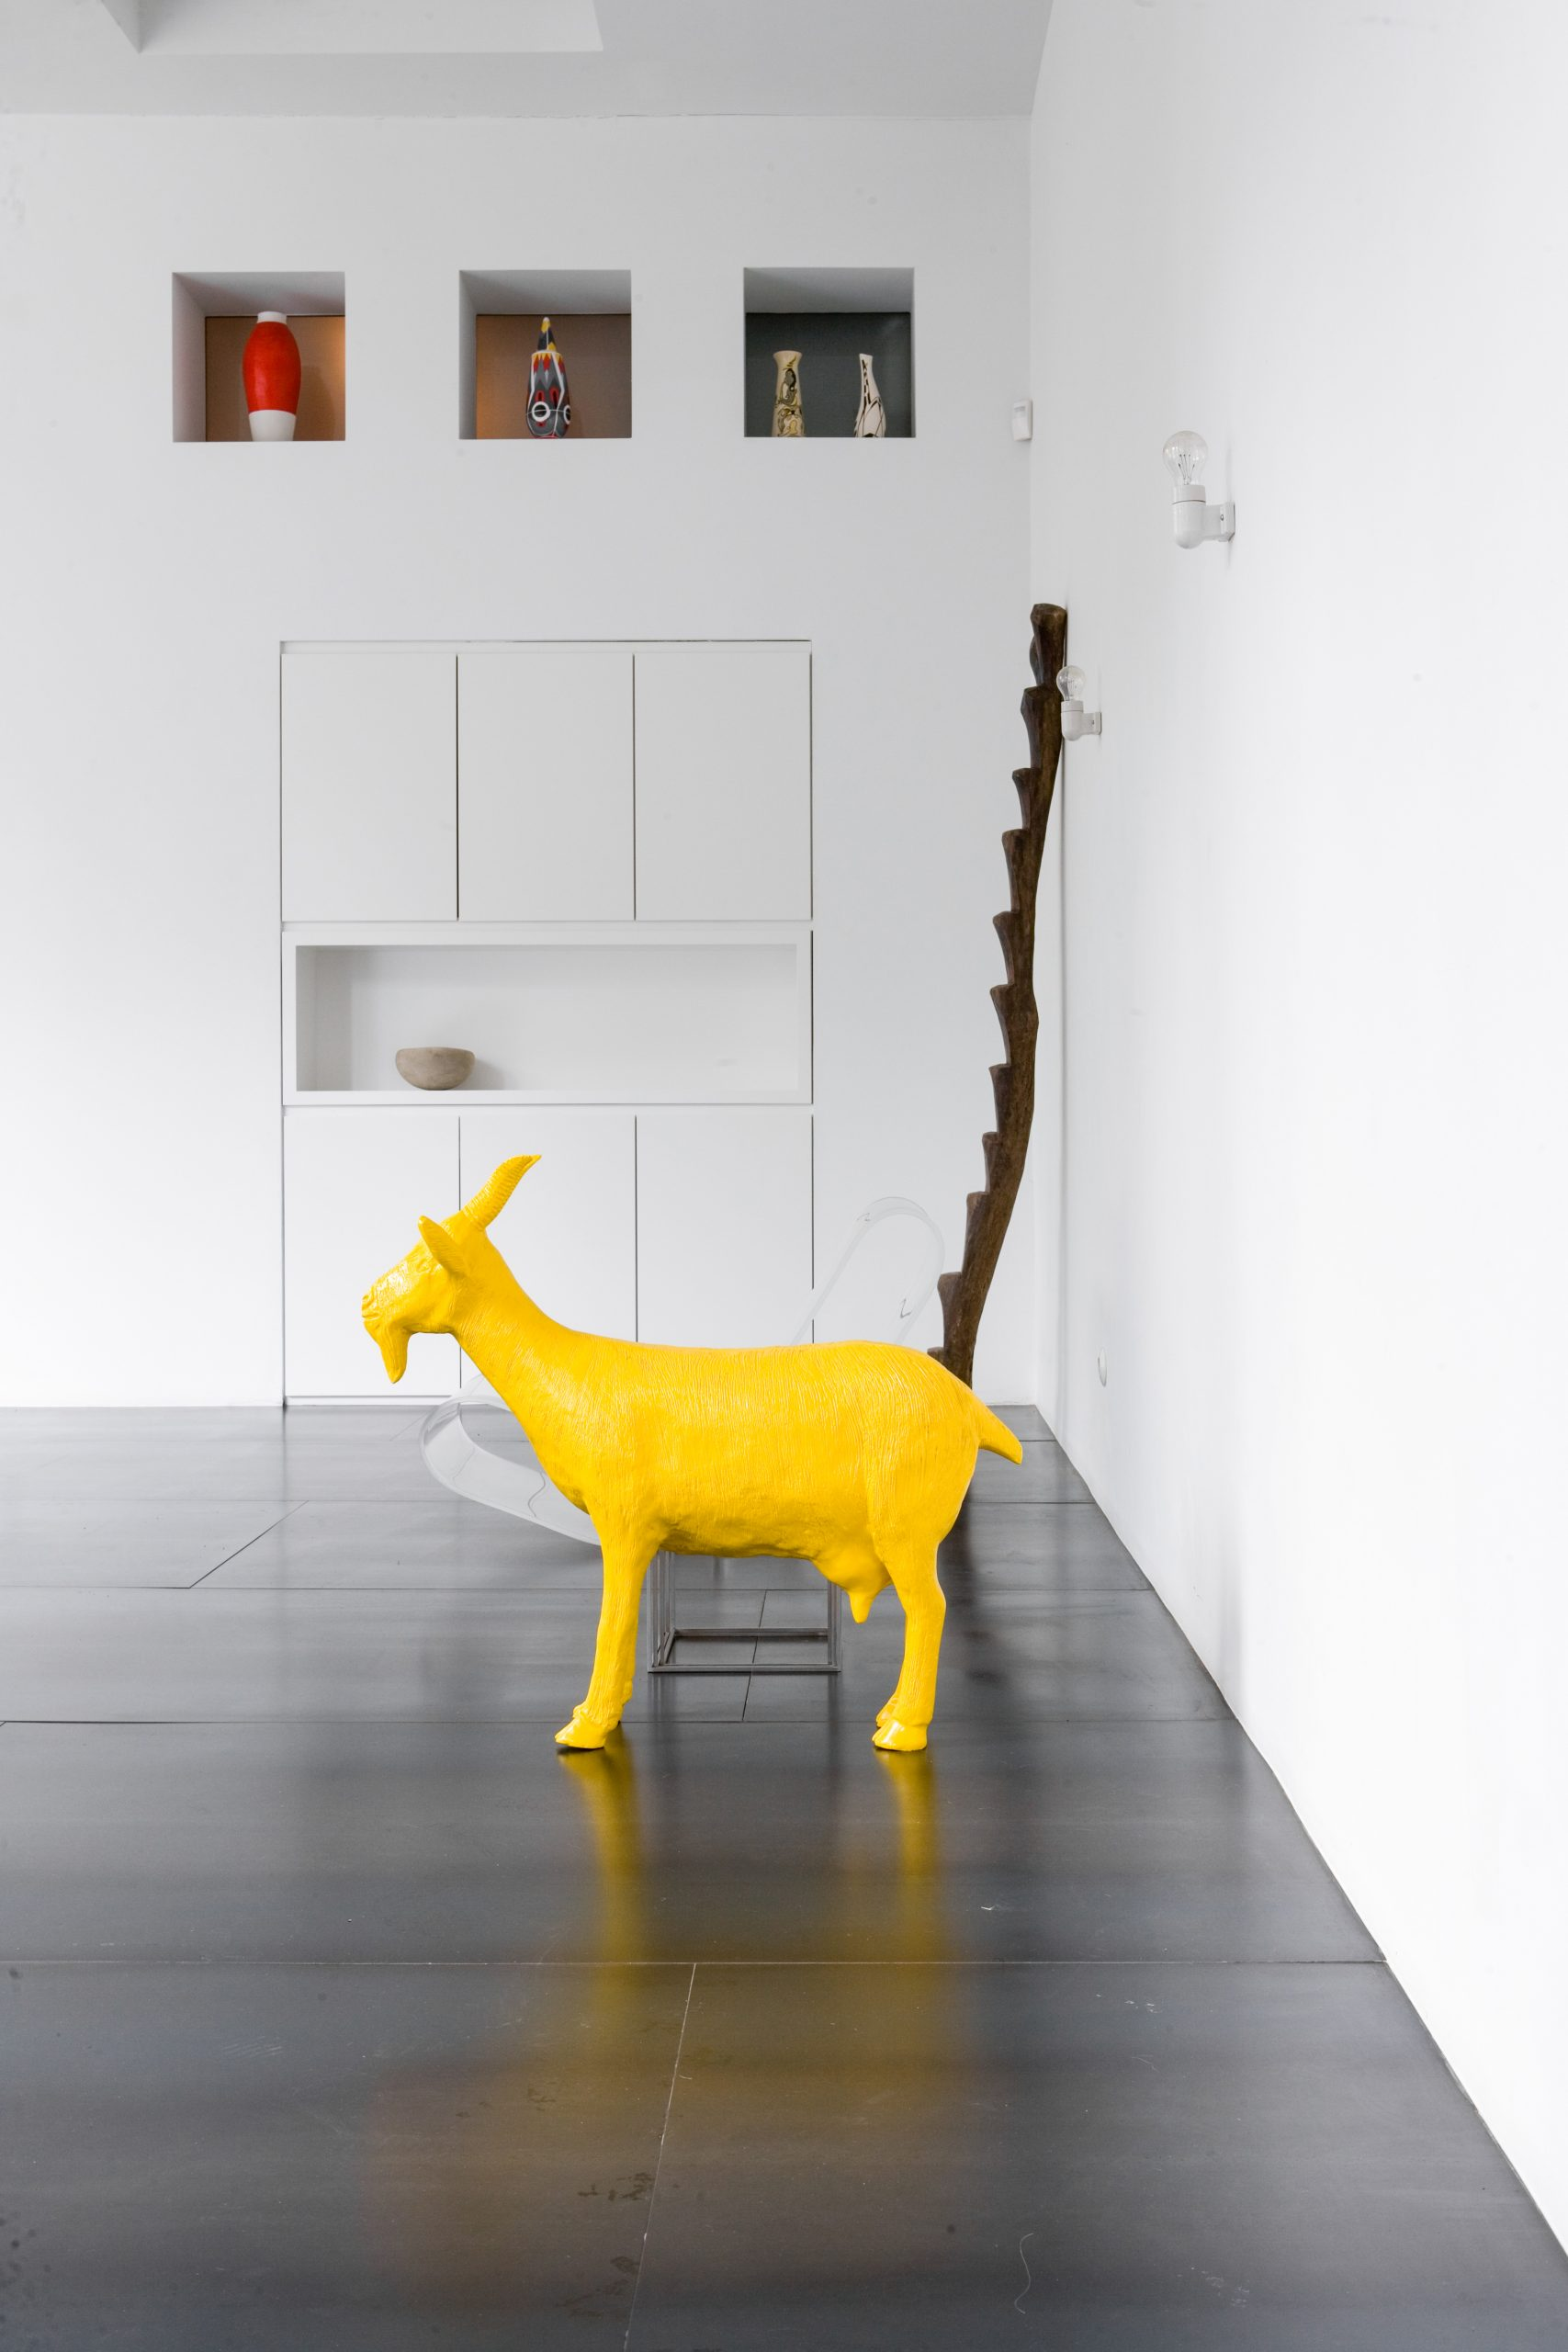 Rewriting history yellow goat